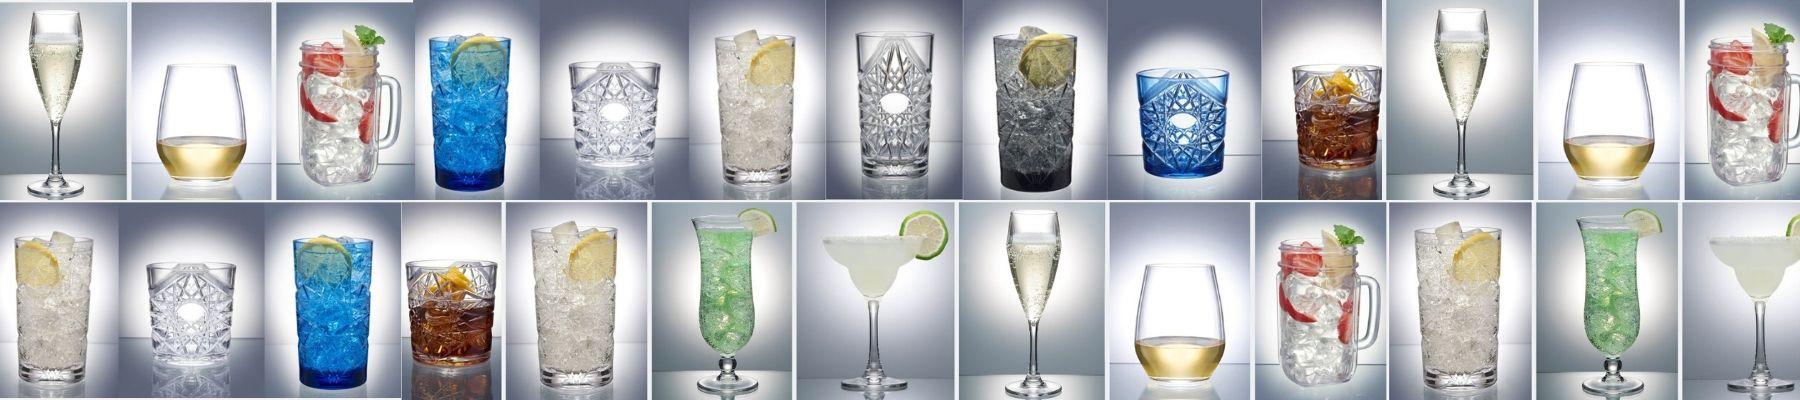 Plastic Stemless wine glasses